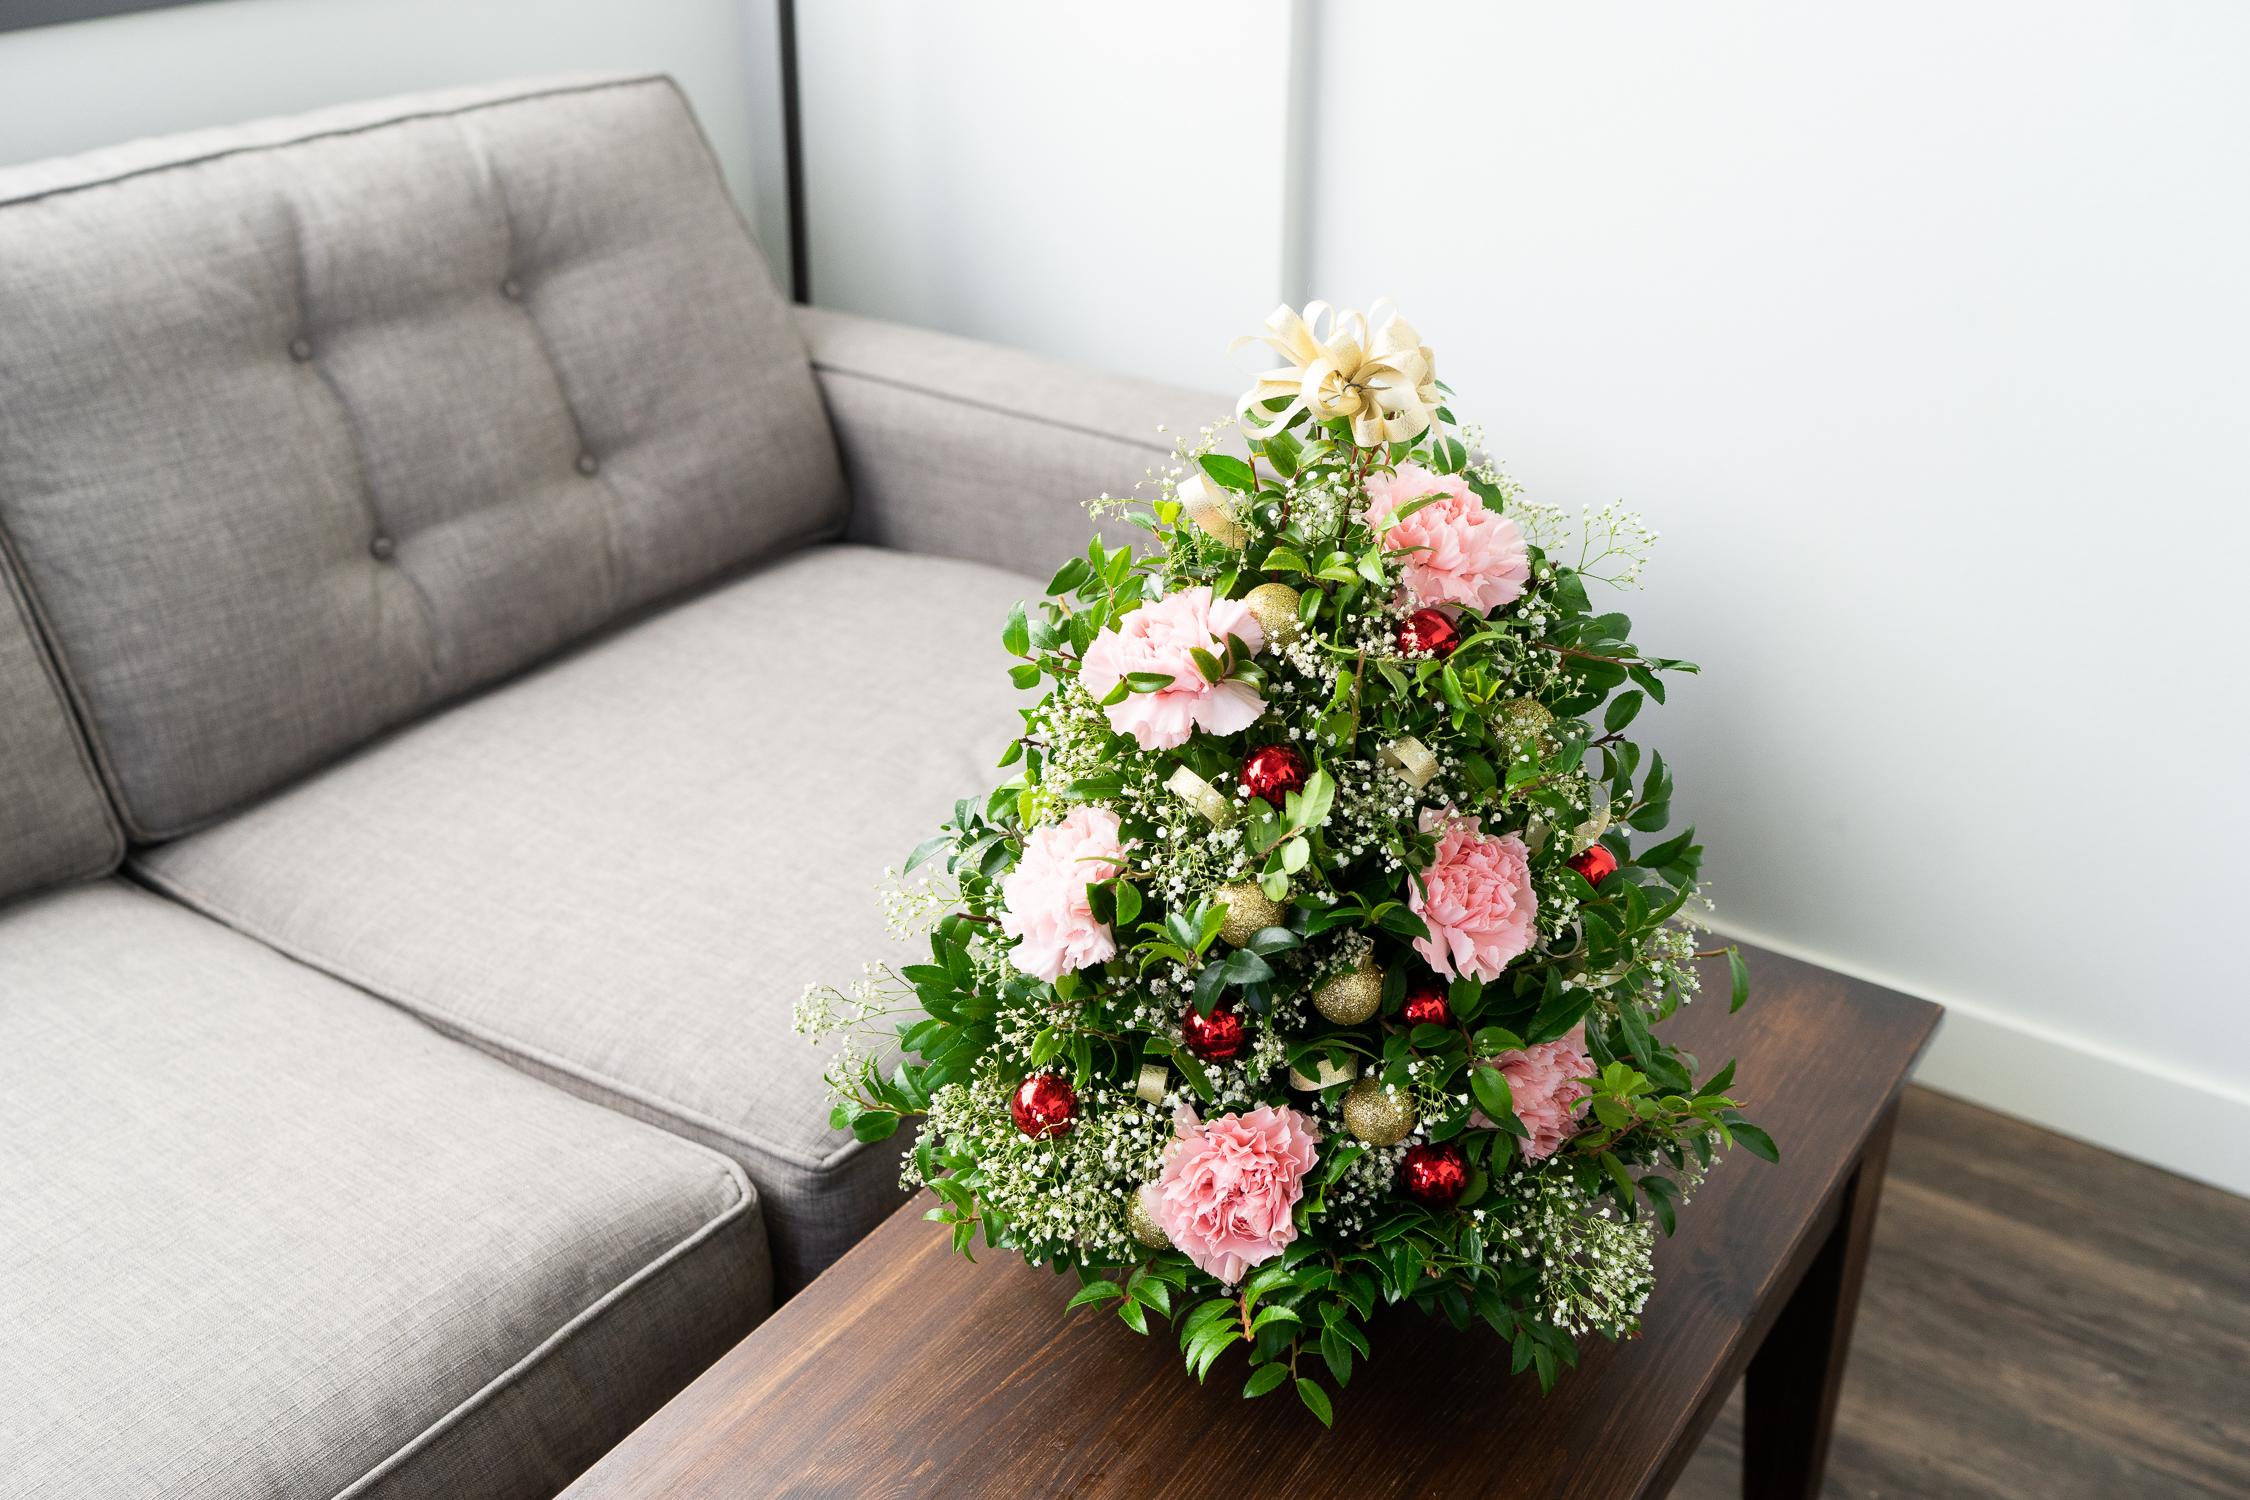 Flowers That Look Like Christmas Trees